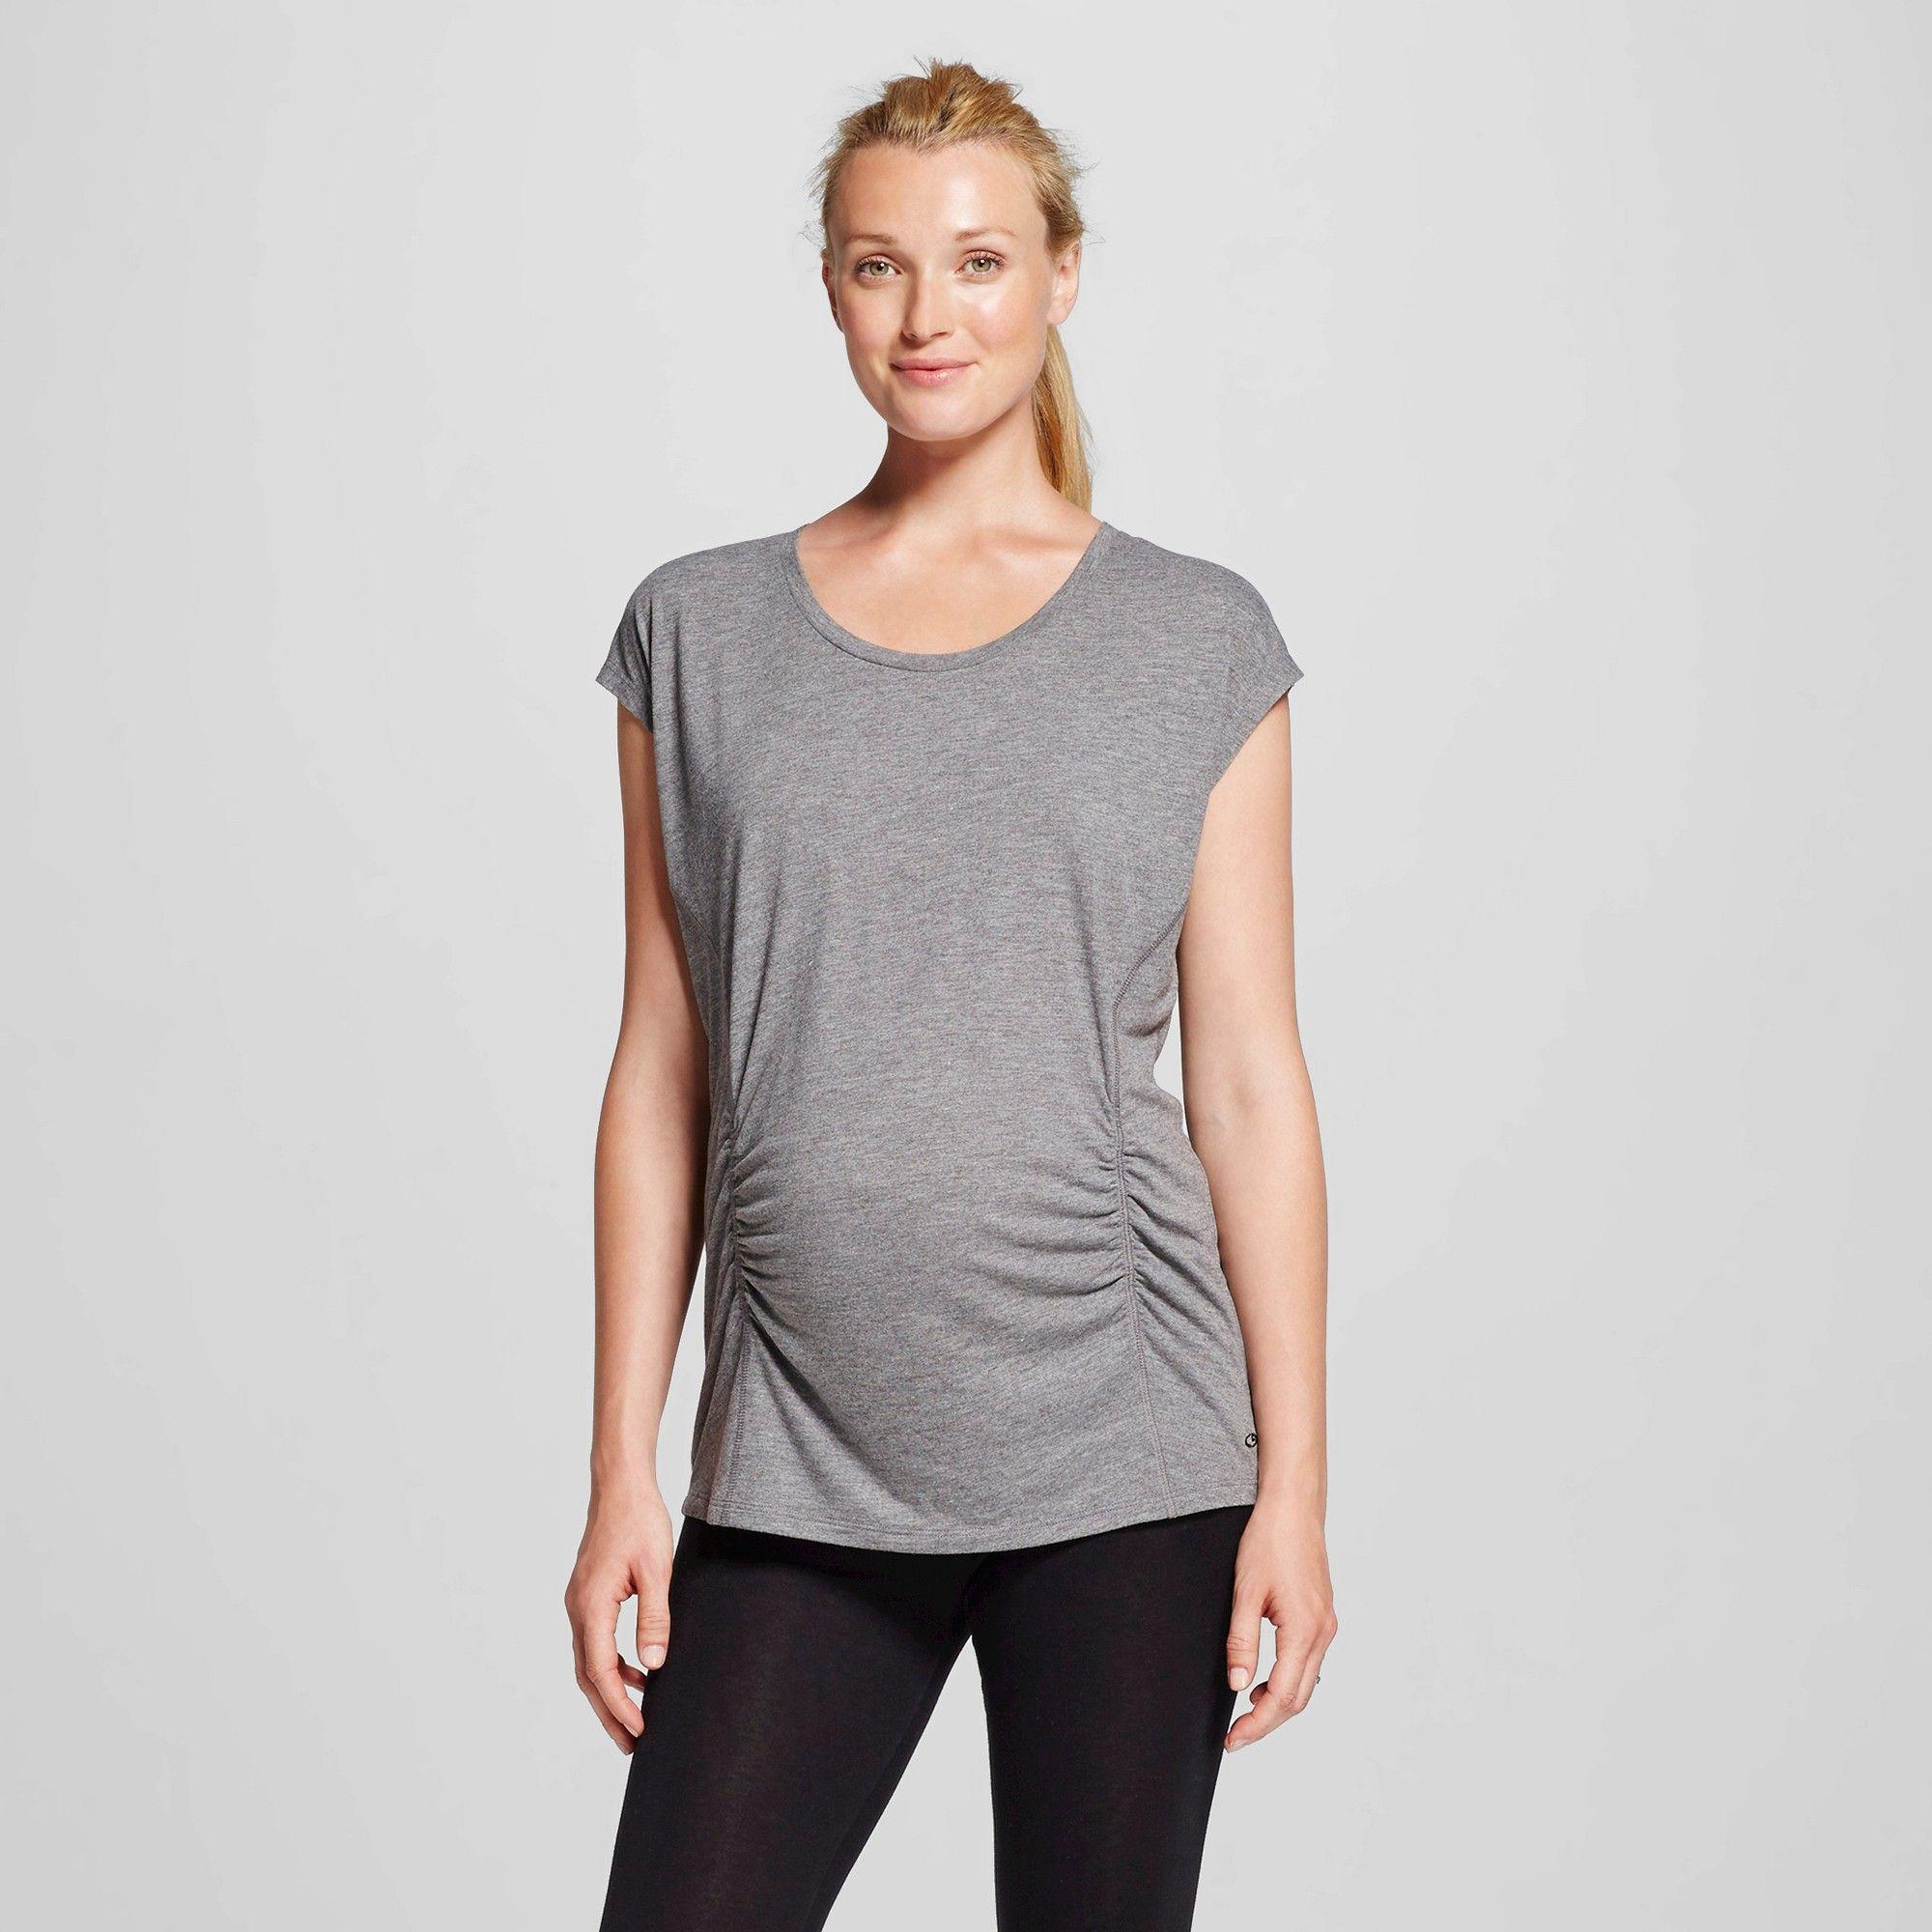 8d2dd18df Maternity Active T-Shirt - C9 Champion Black Heather Xxl, Women's ...